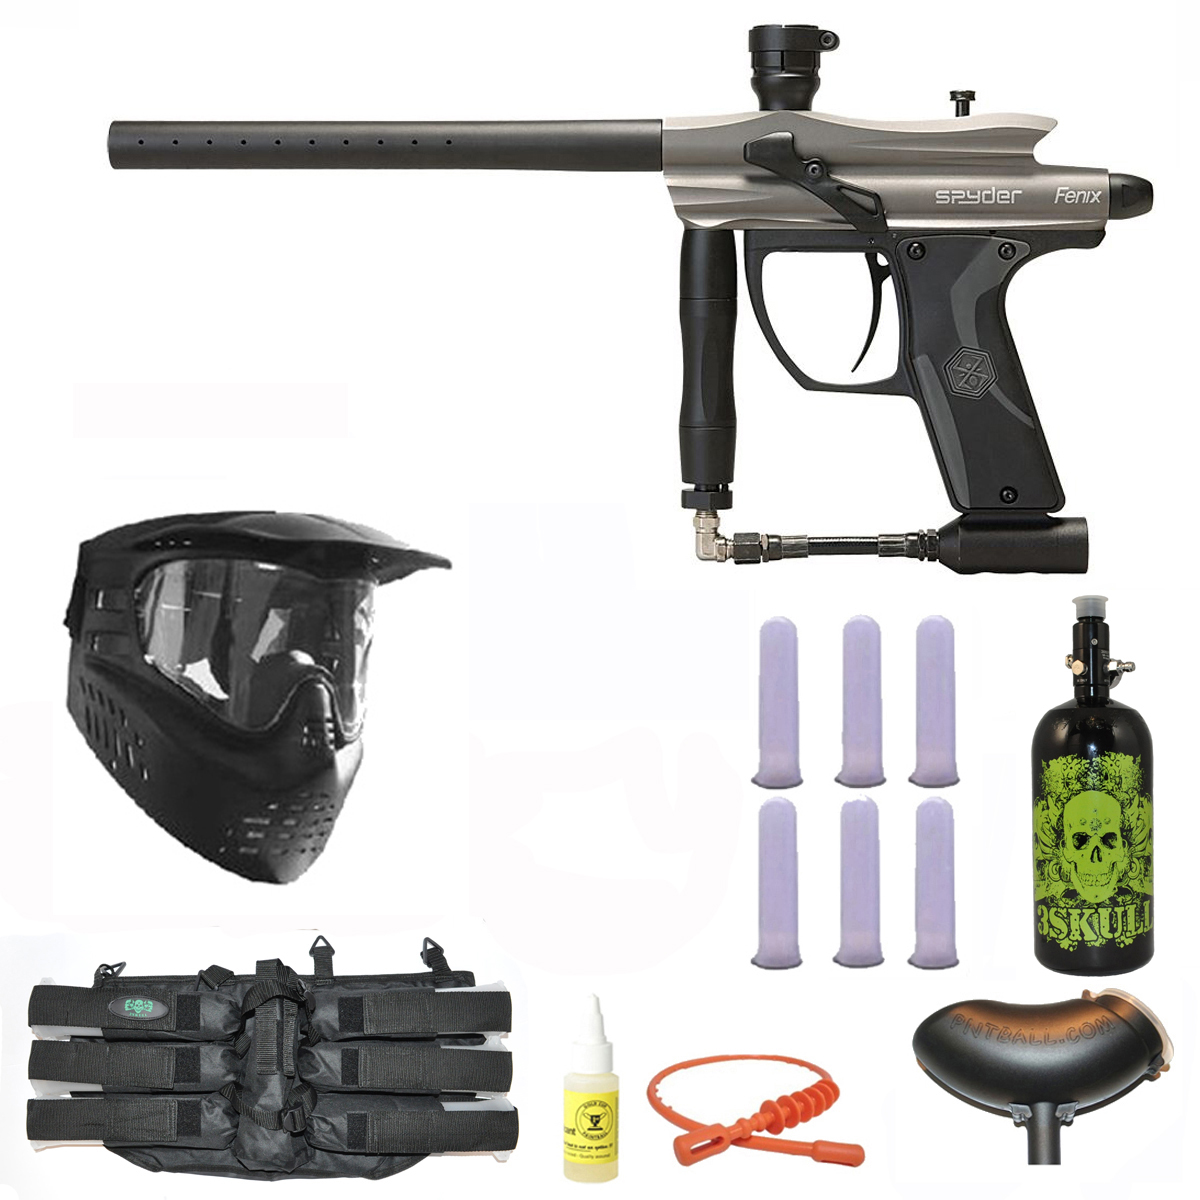 Spyder Fenix Electronic Paintball Marker Gun 3Skull N2 Mega Set Silver Grey by